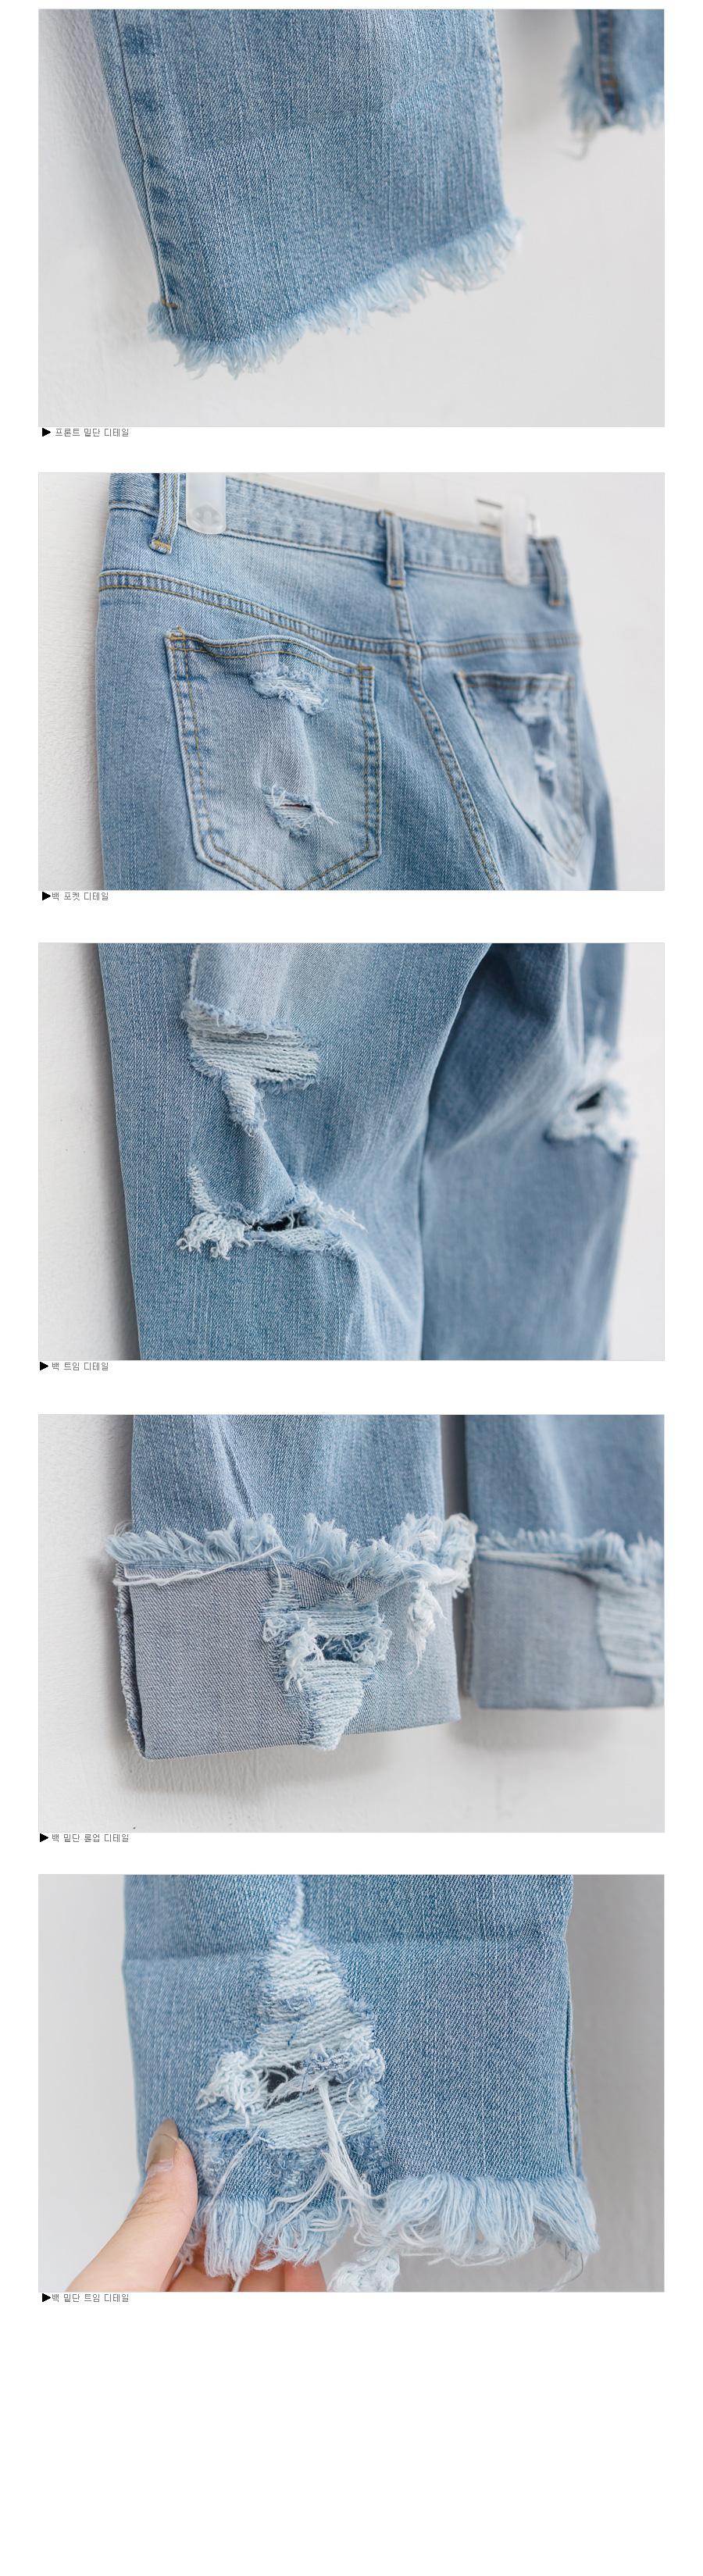 Terran Straight Fit Damage Pants #73405